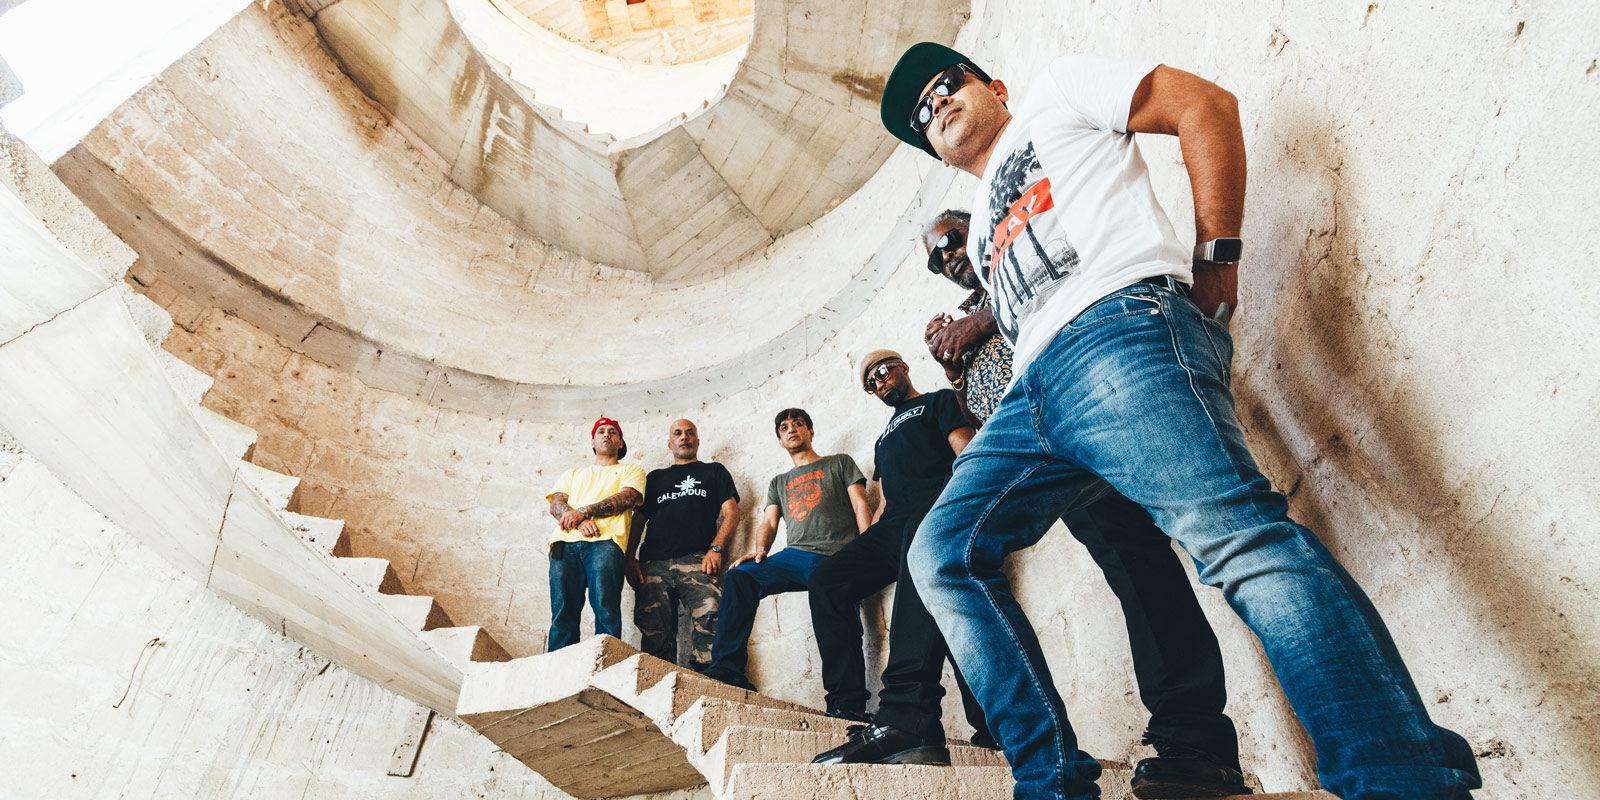 Asian Dub Foundation<br> + Manudigital djset